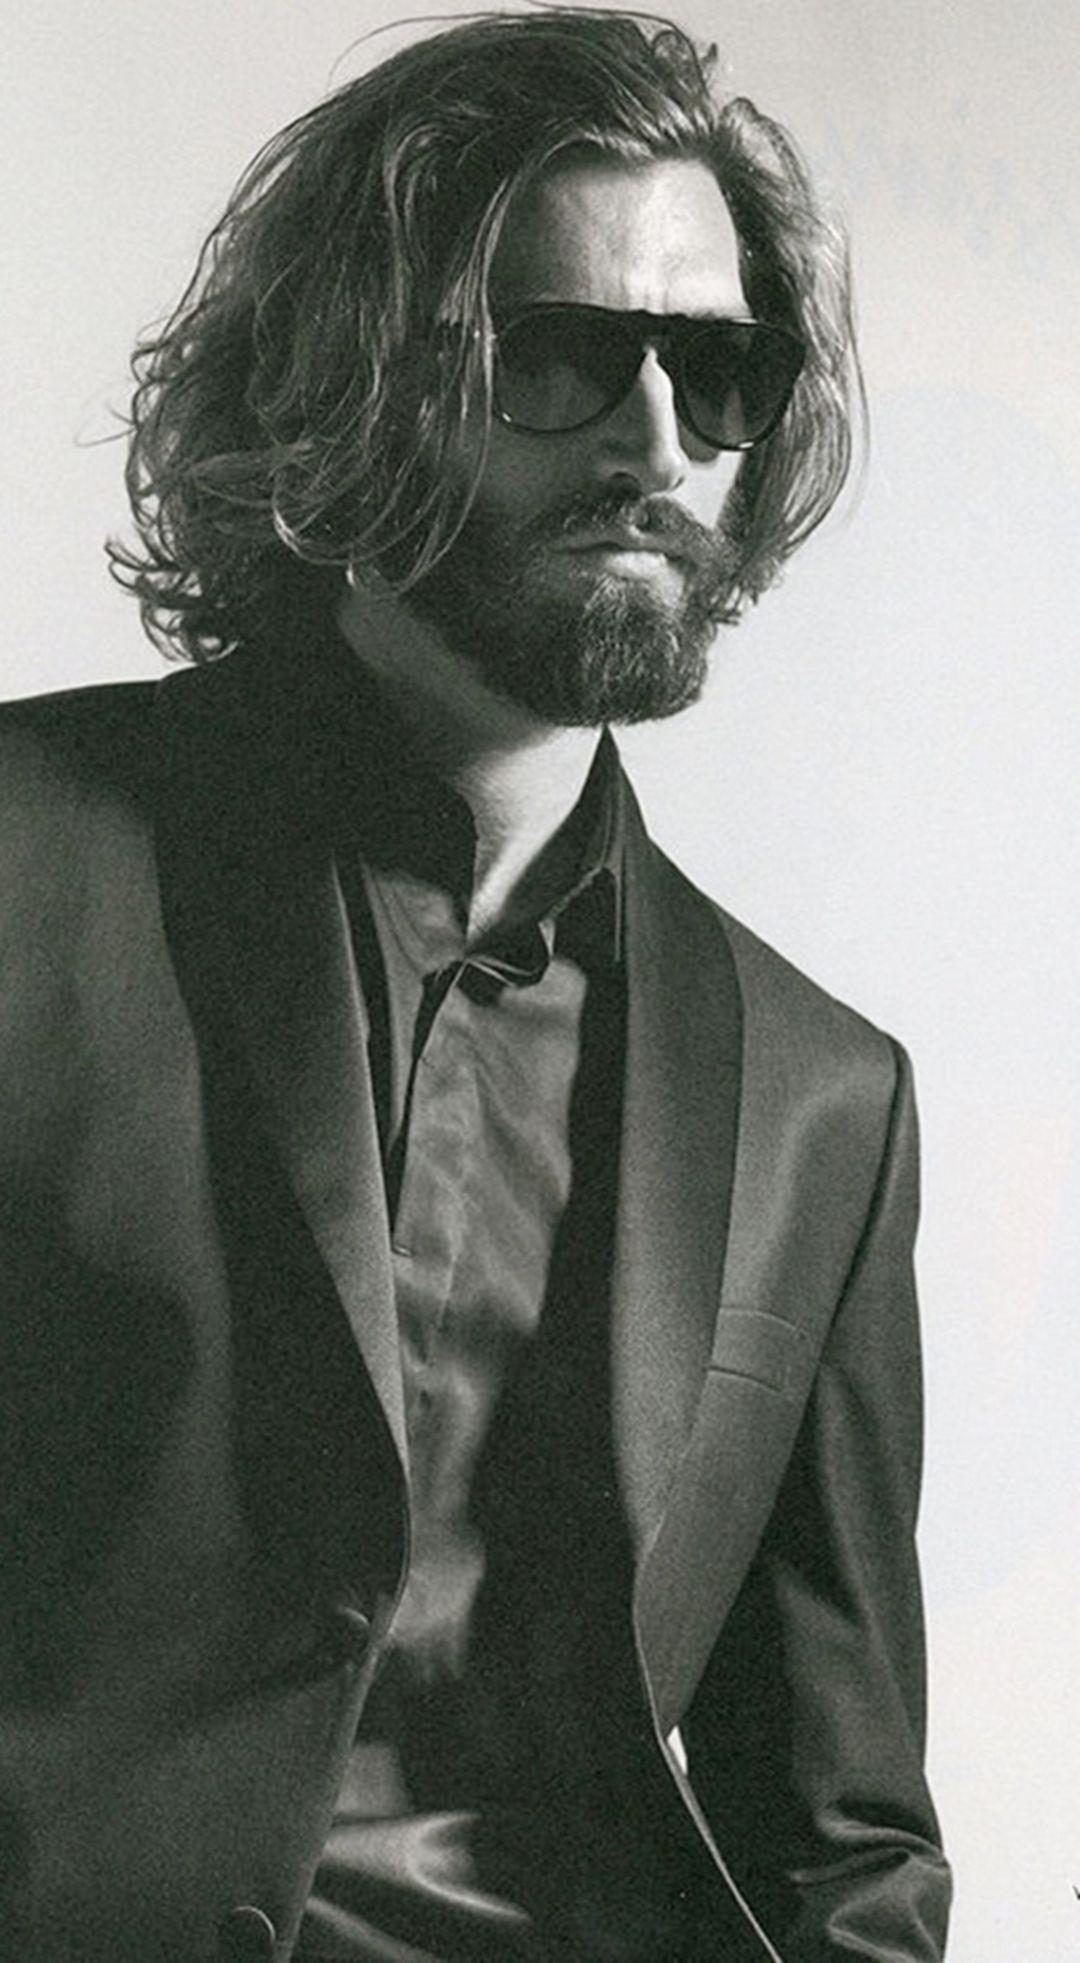 35 Fantastic Long Hair And Beard Ideas For Handsome Man #hairandbeardstyles